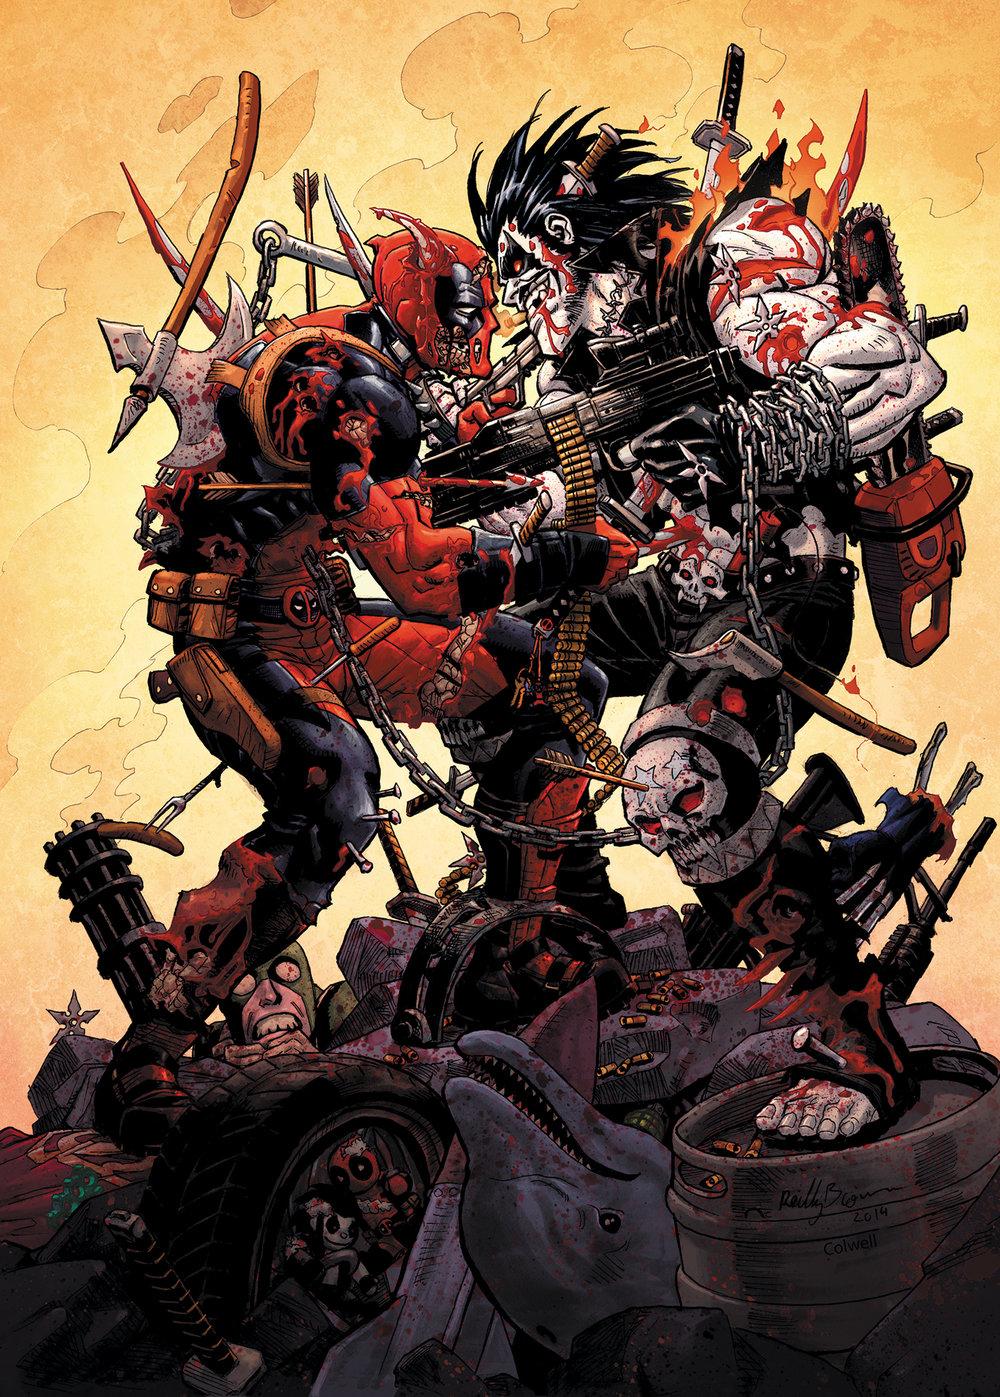 Reilly Deadpool vs Lobo